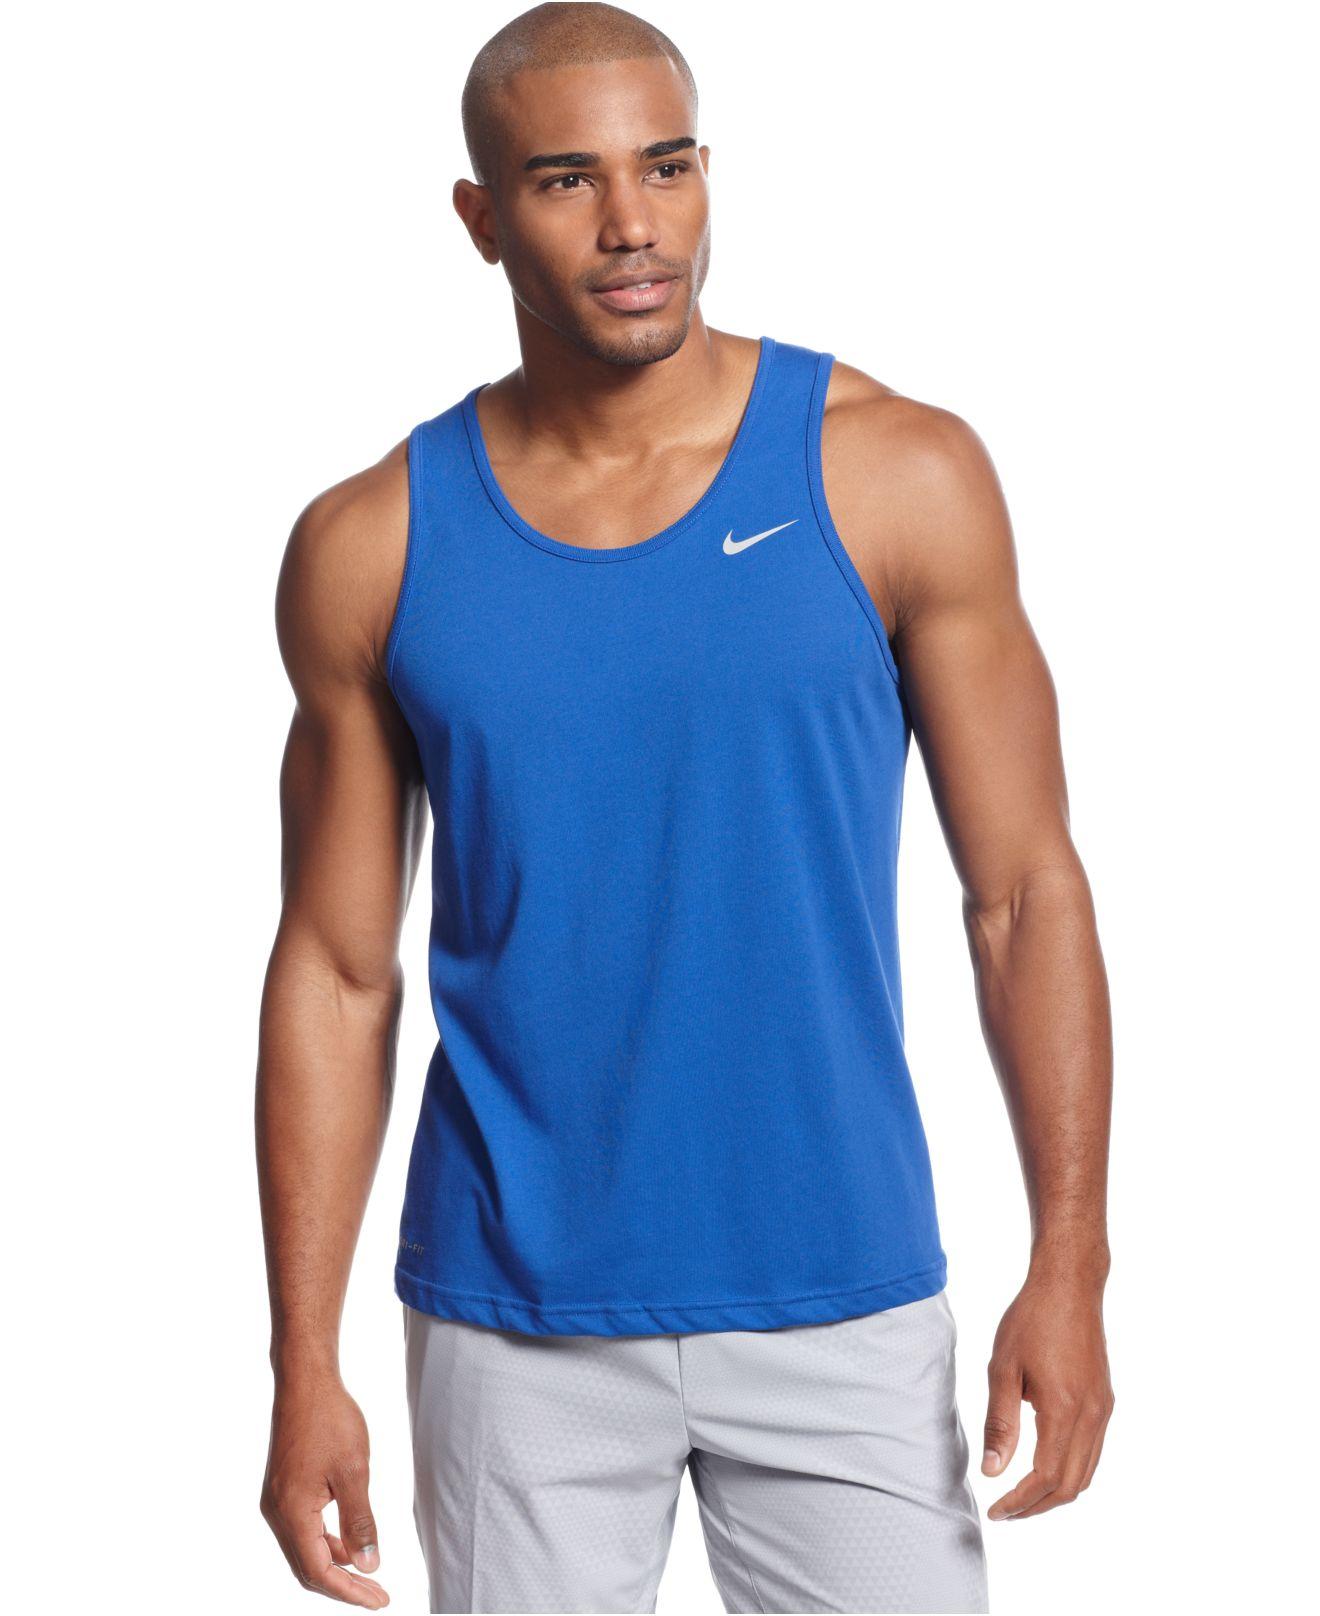 4810bd4cb6c662 Lyst - Nike Dri-Fit Tank in Blue for Men